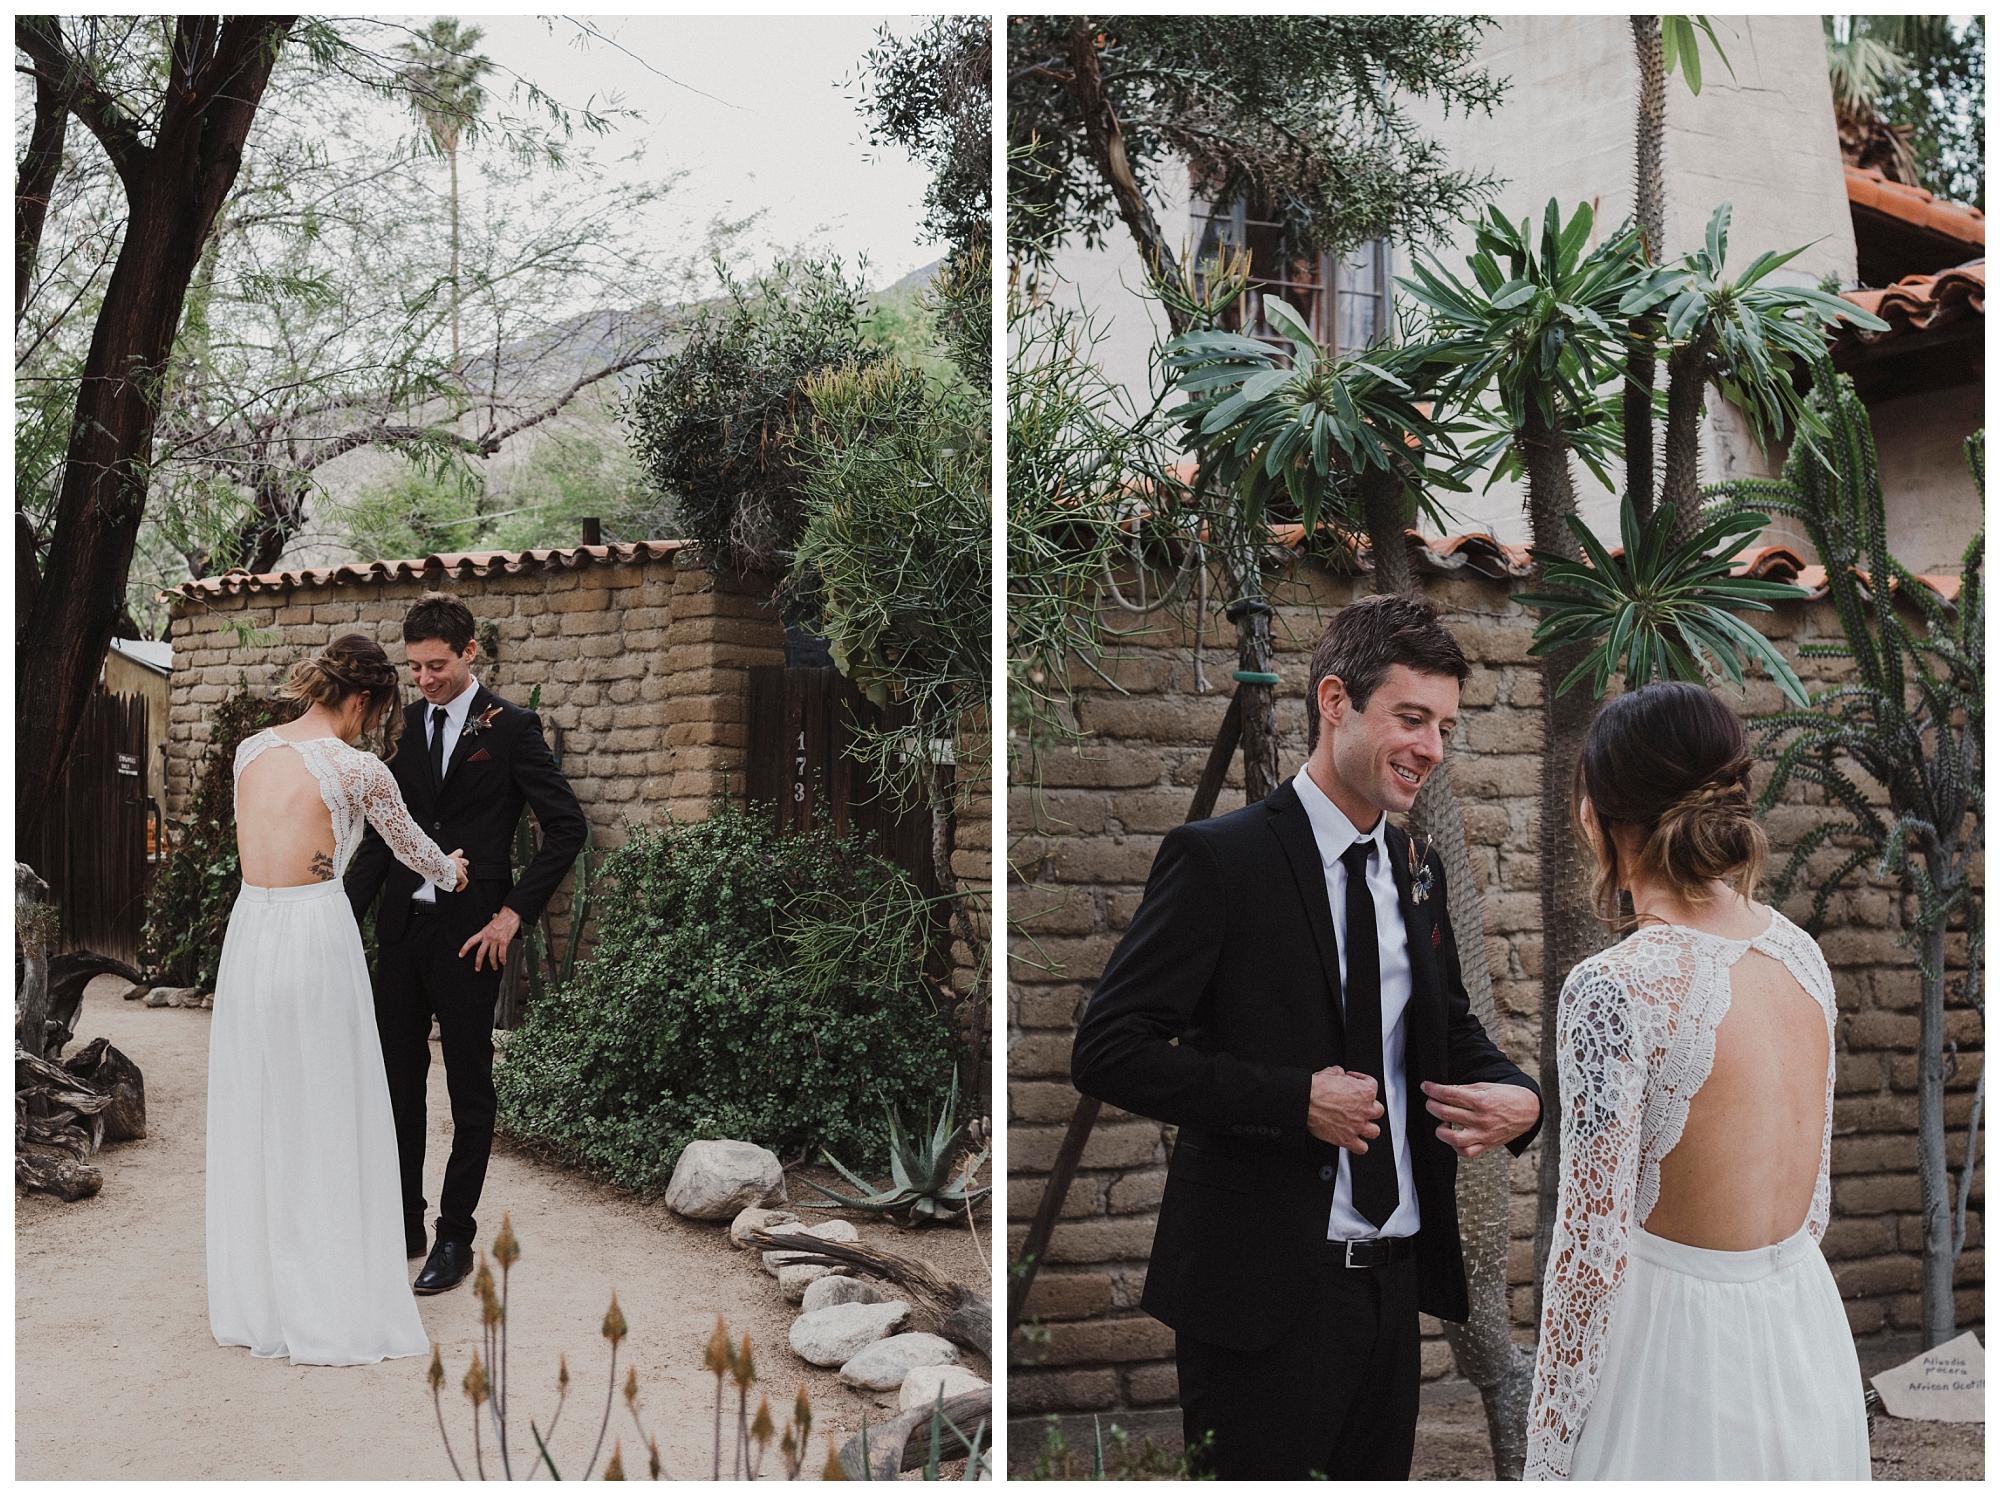 Ace Hotel Wedding Palm Springs (20).jpg